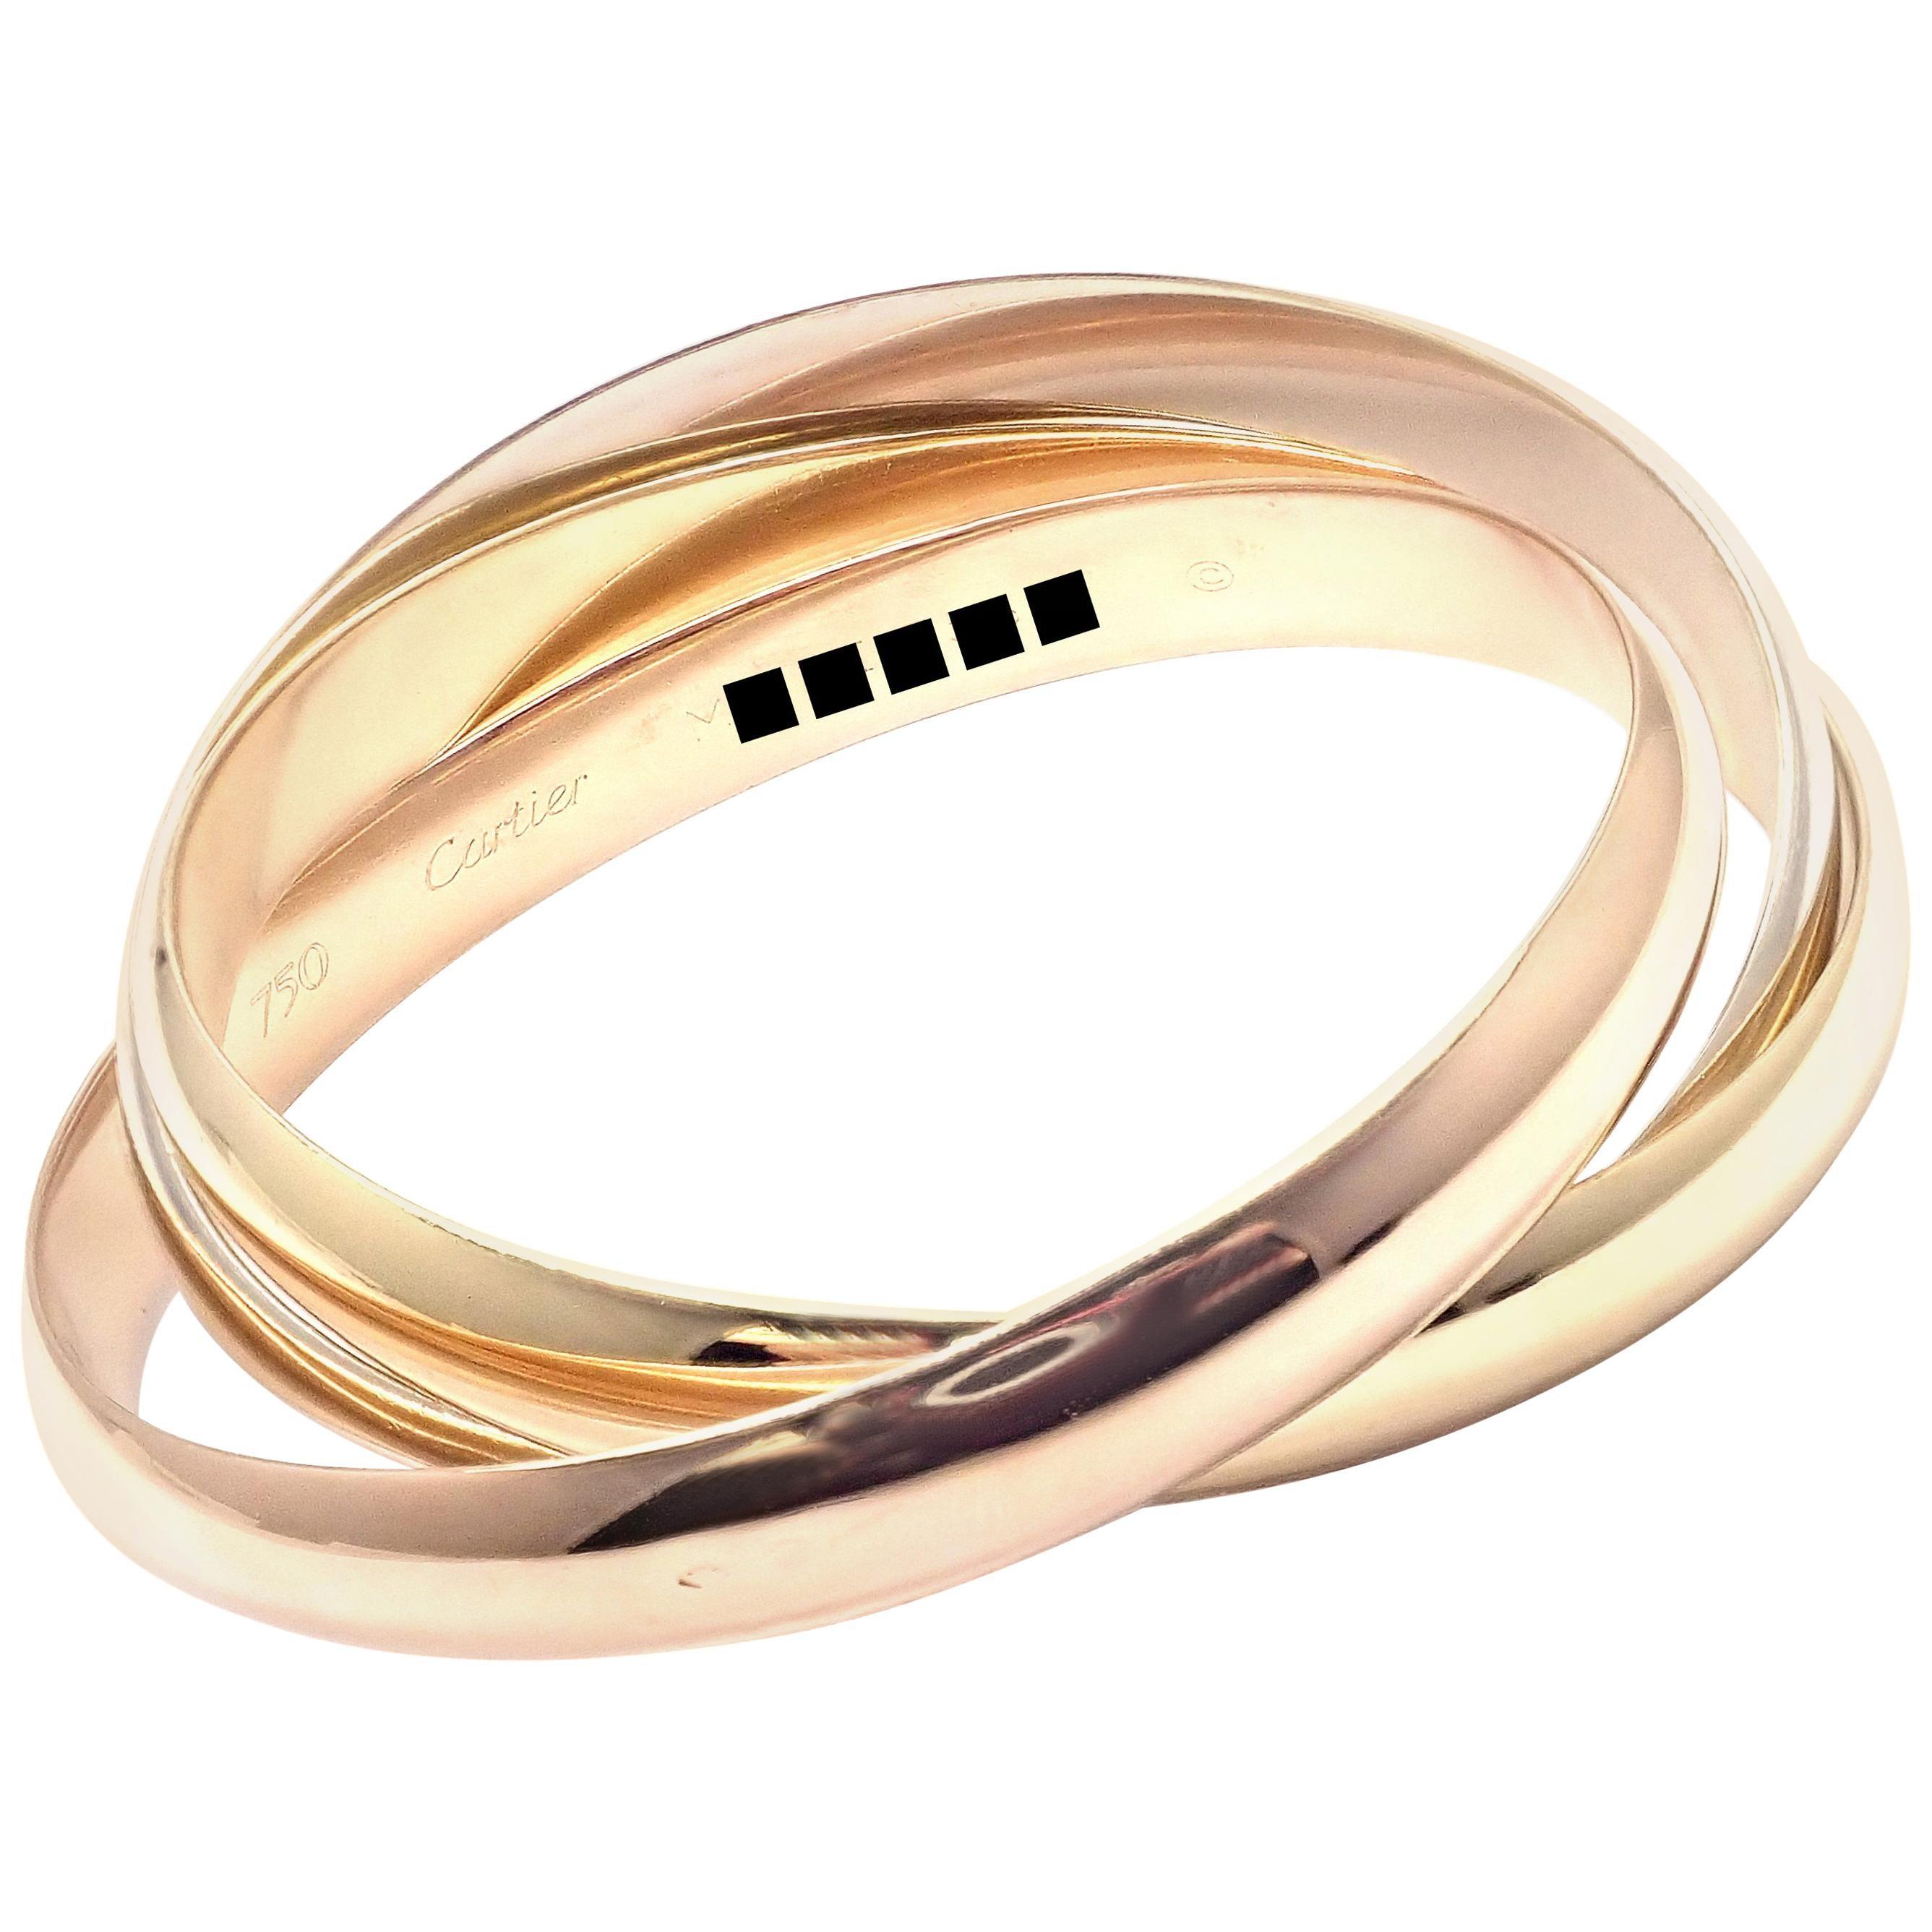 Cartier Trinity Rolling Large Model Tricolor Gold Medium Size Bangle Bracelet